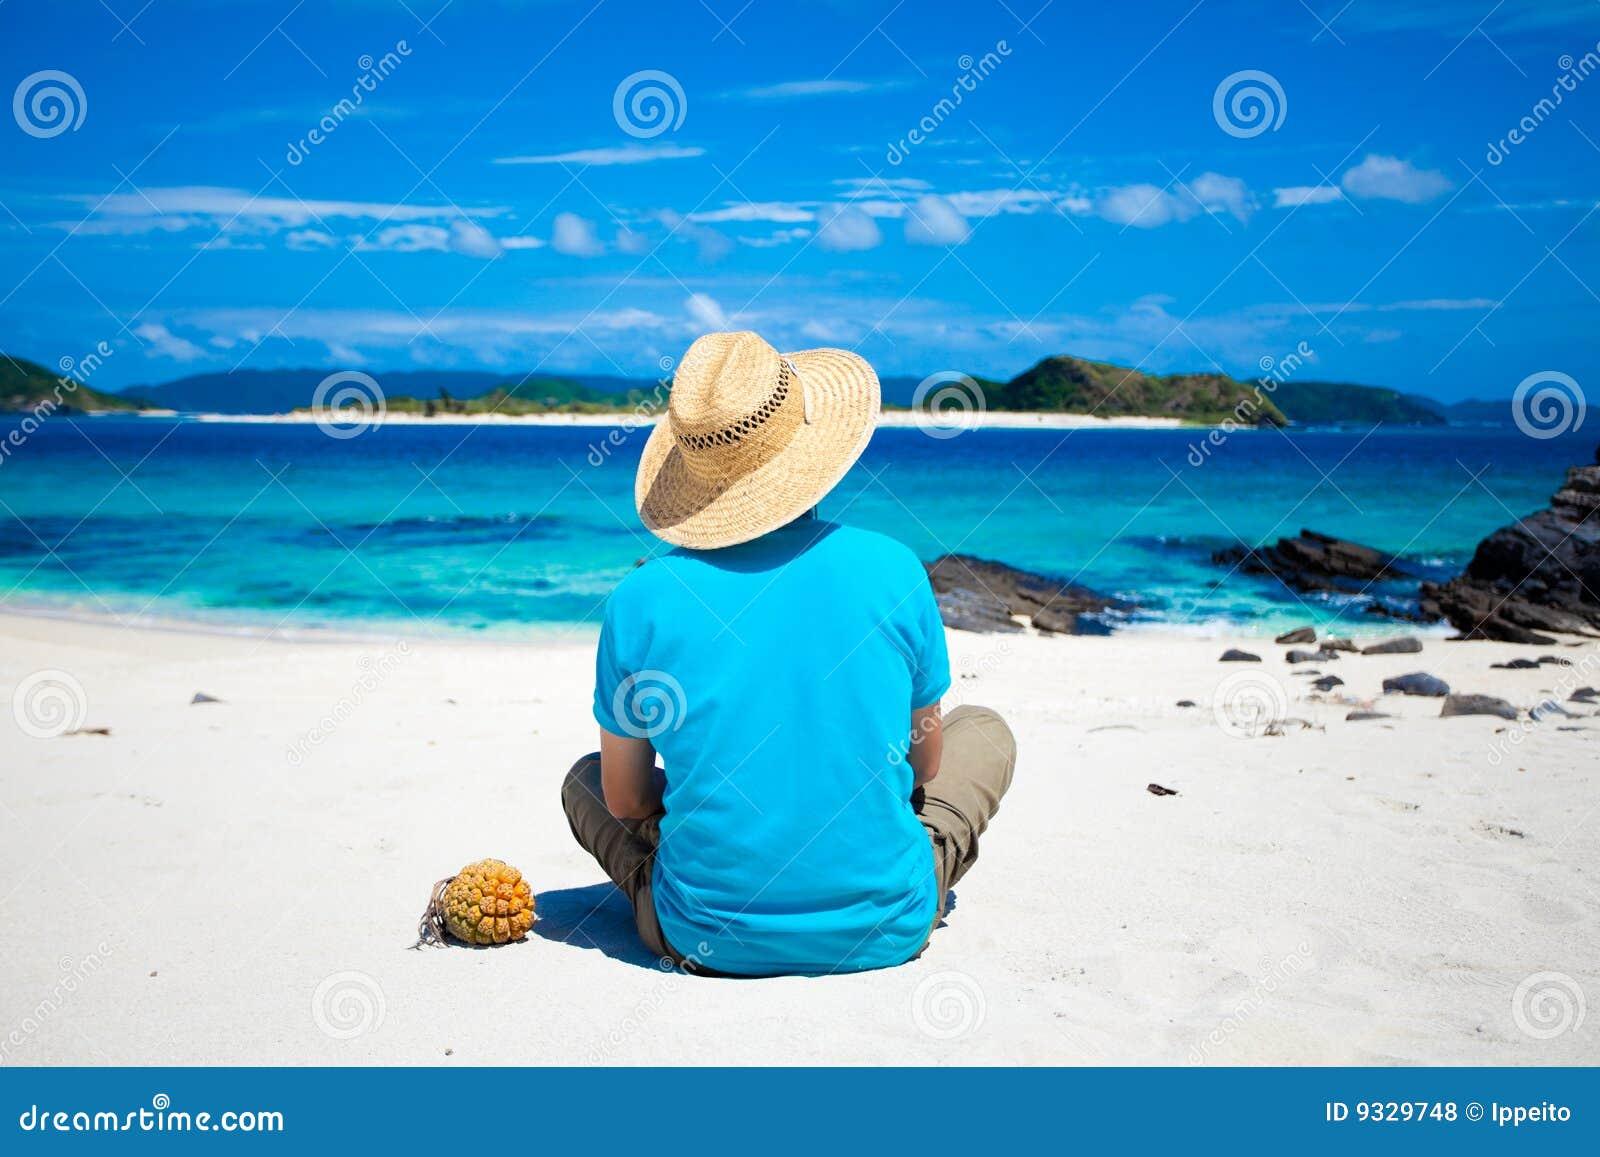 Man sitting on the tropical island beach